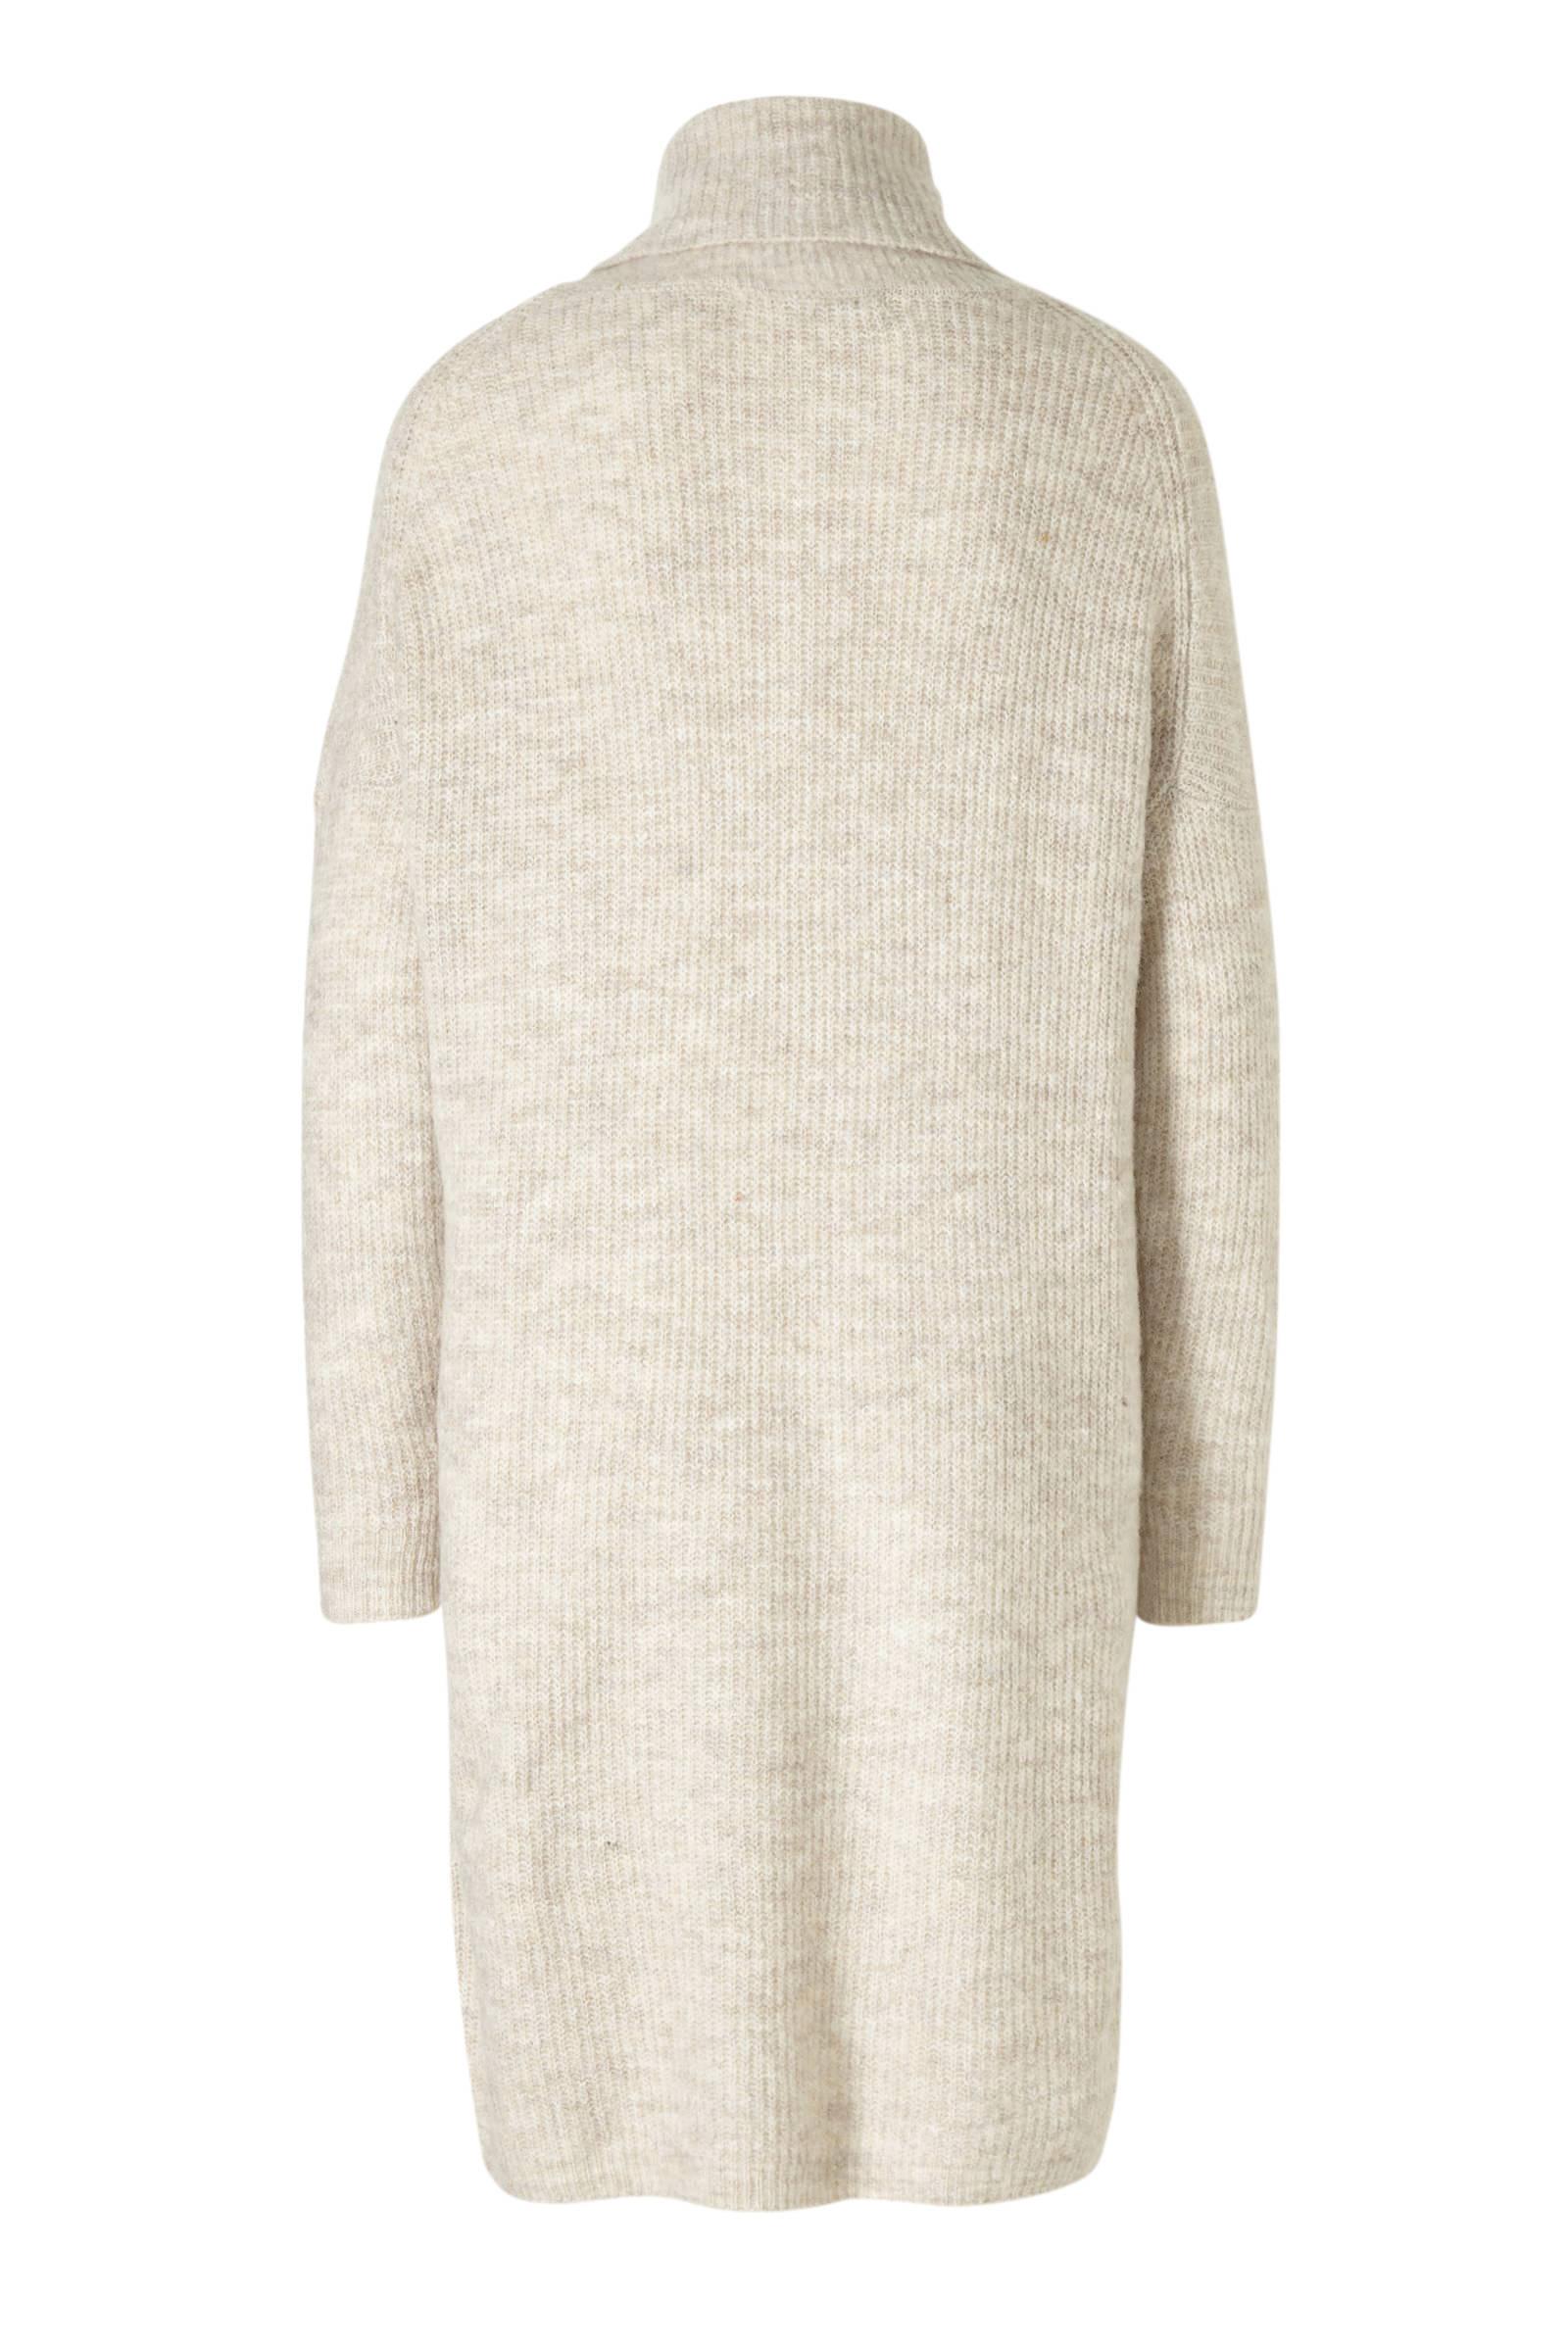 Verwonderlijk ONLY grofgebreide jurk beige   wehkamp LH-27